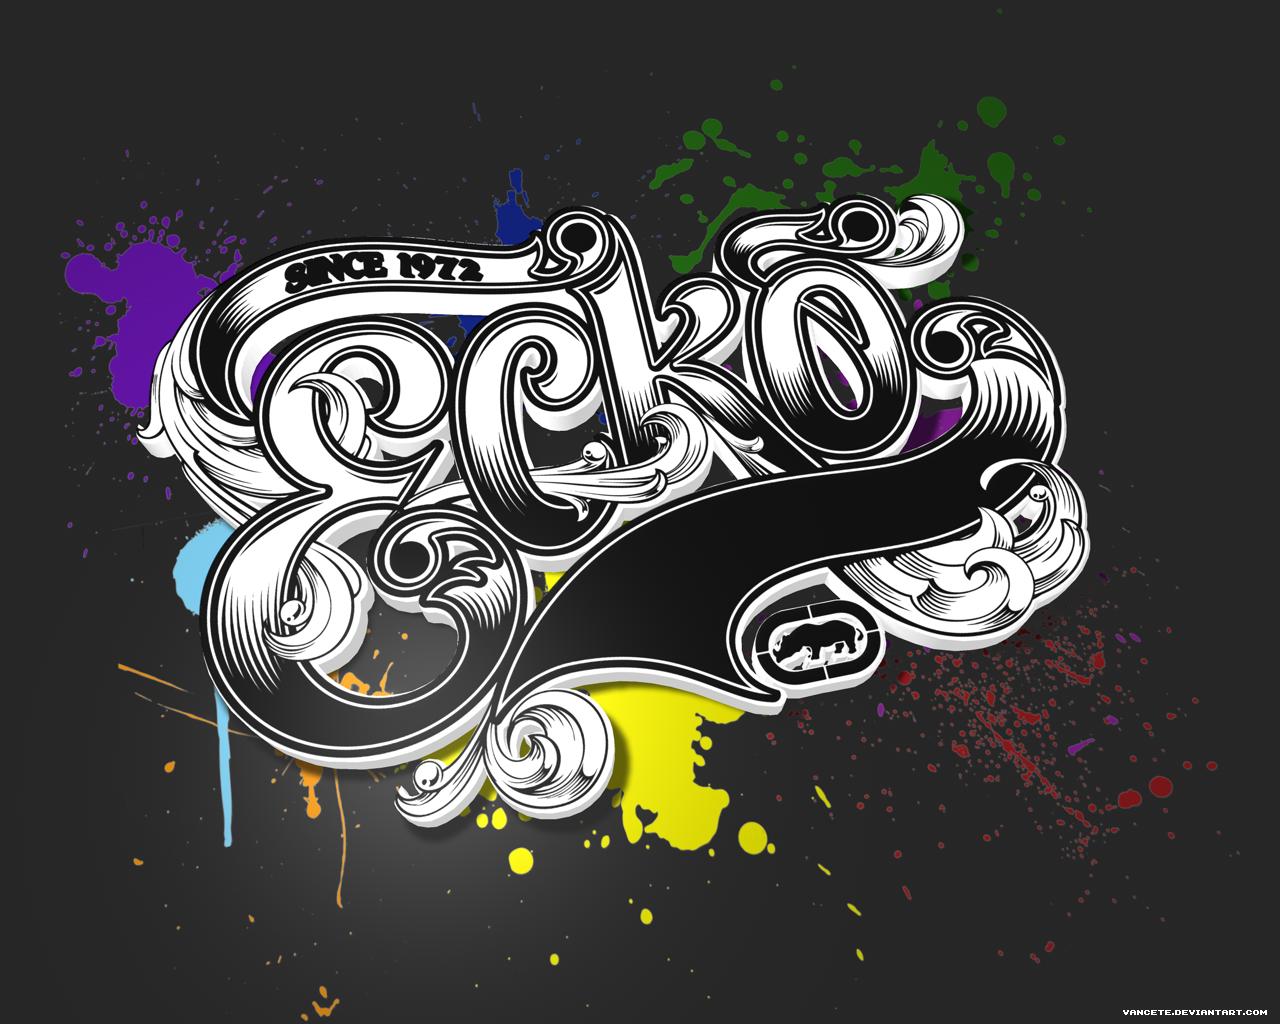 Google themes ecko - Ecko Unlimited Google Search